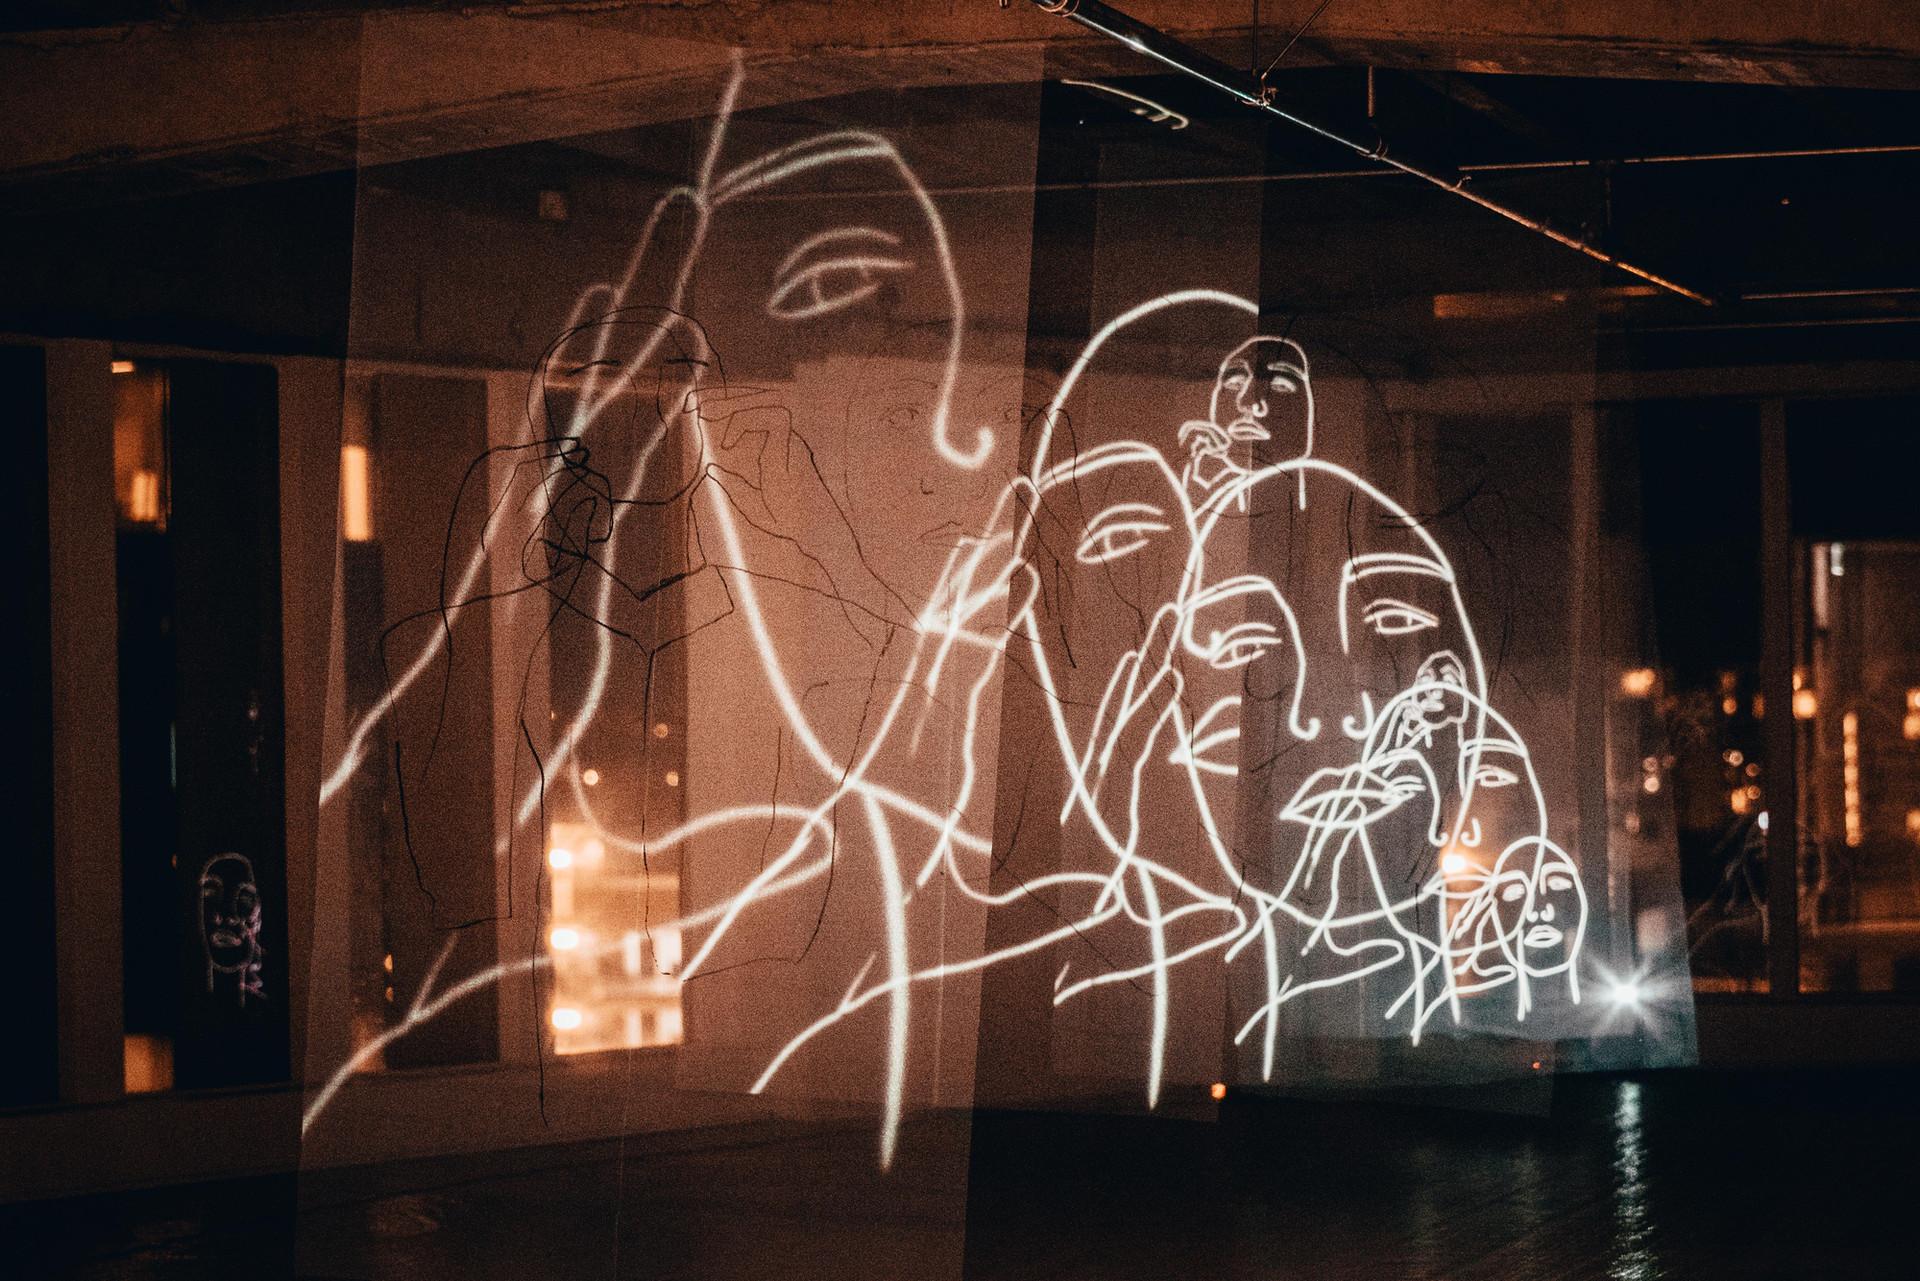 Light projection over frabric  1 Albert Street October 2020 Photo: Jeremy Ho